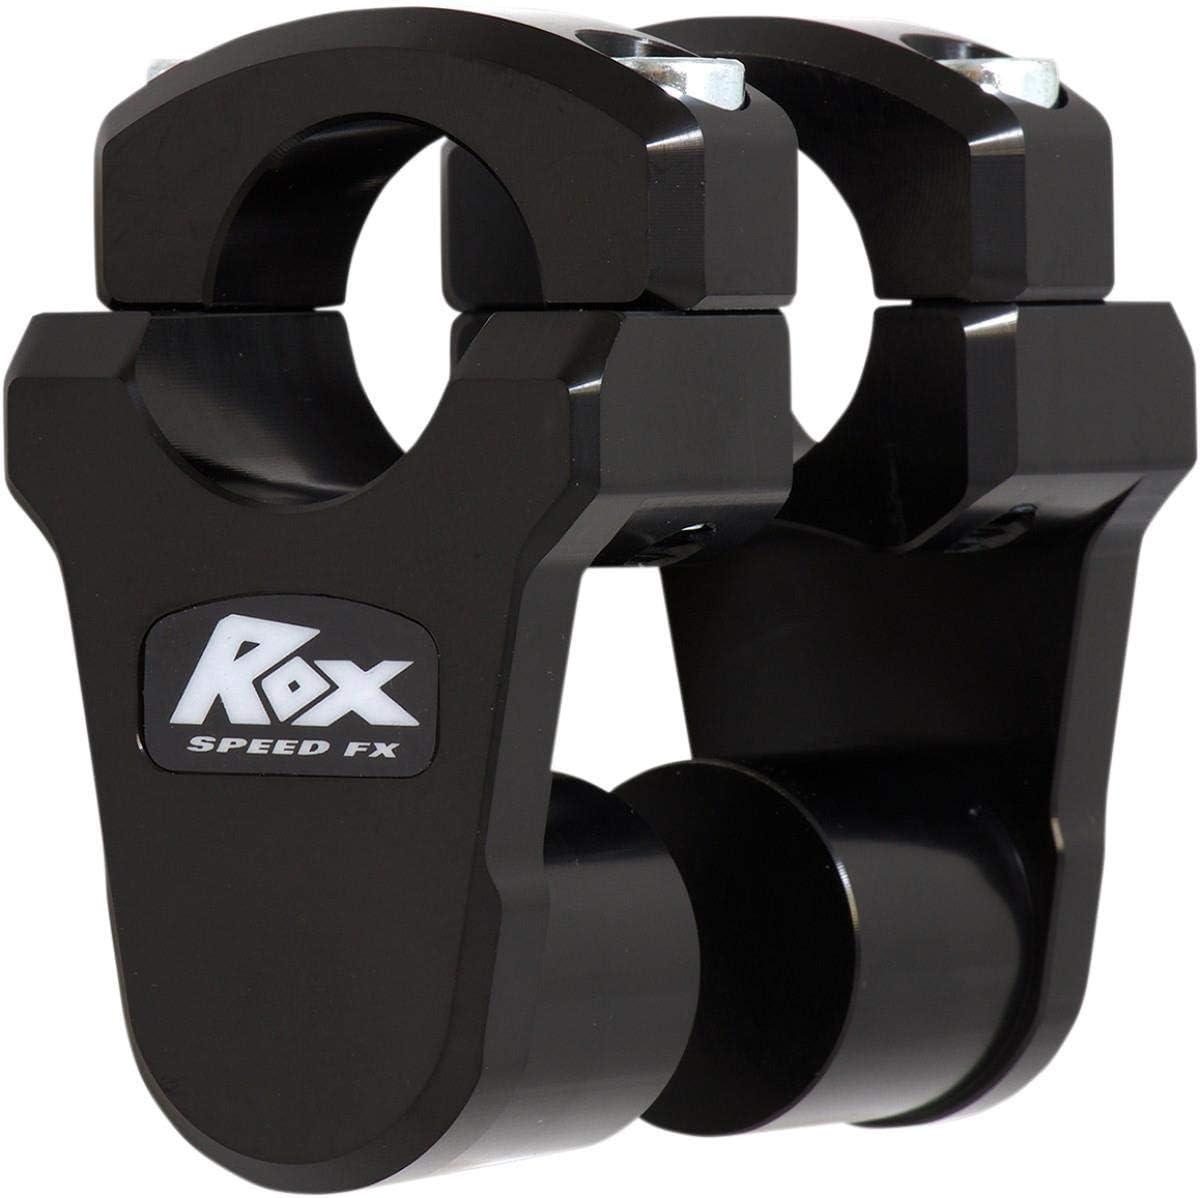 Rox Pivoting Handlebar Riser 2in 1 1//8in Handlebars Rox Speed FX 1R-P2PP